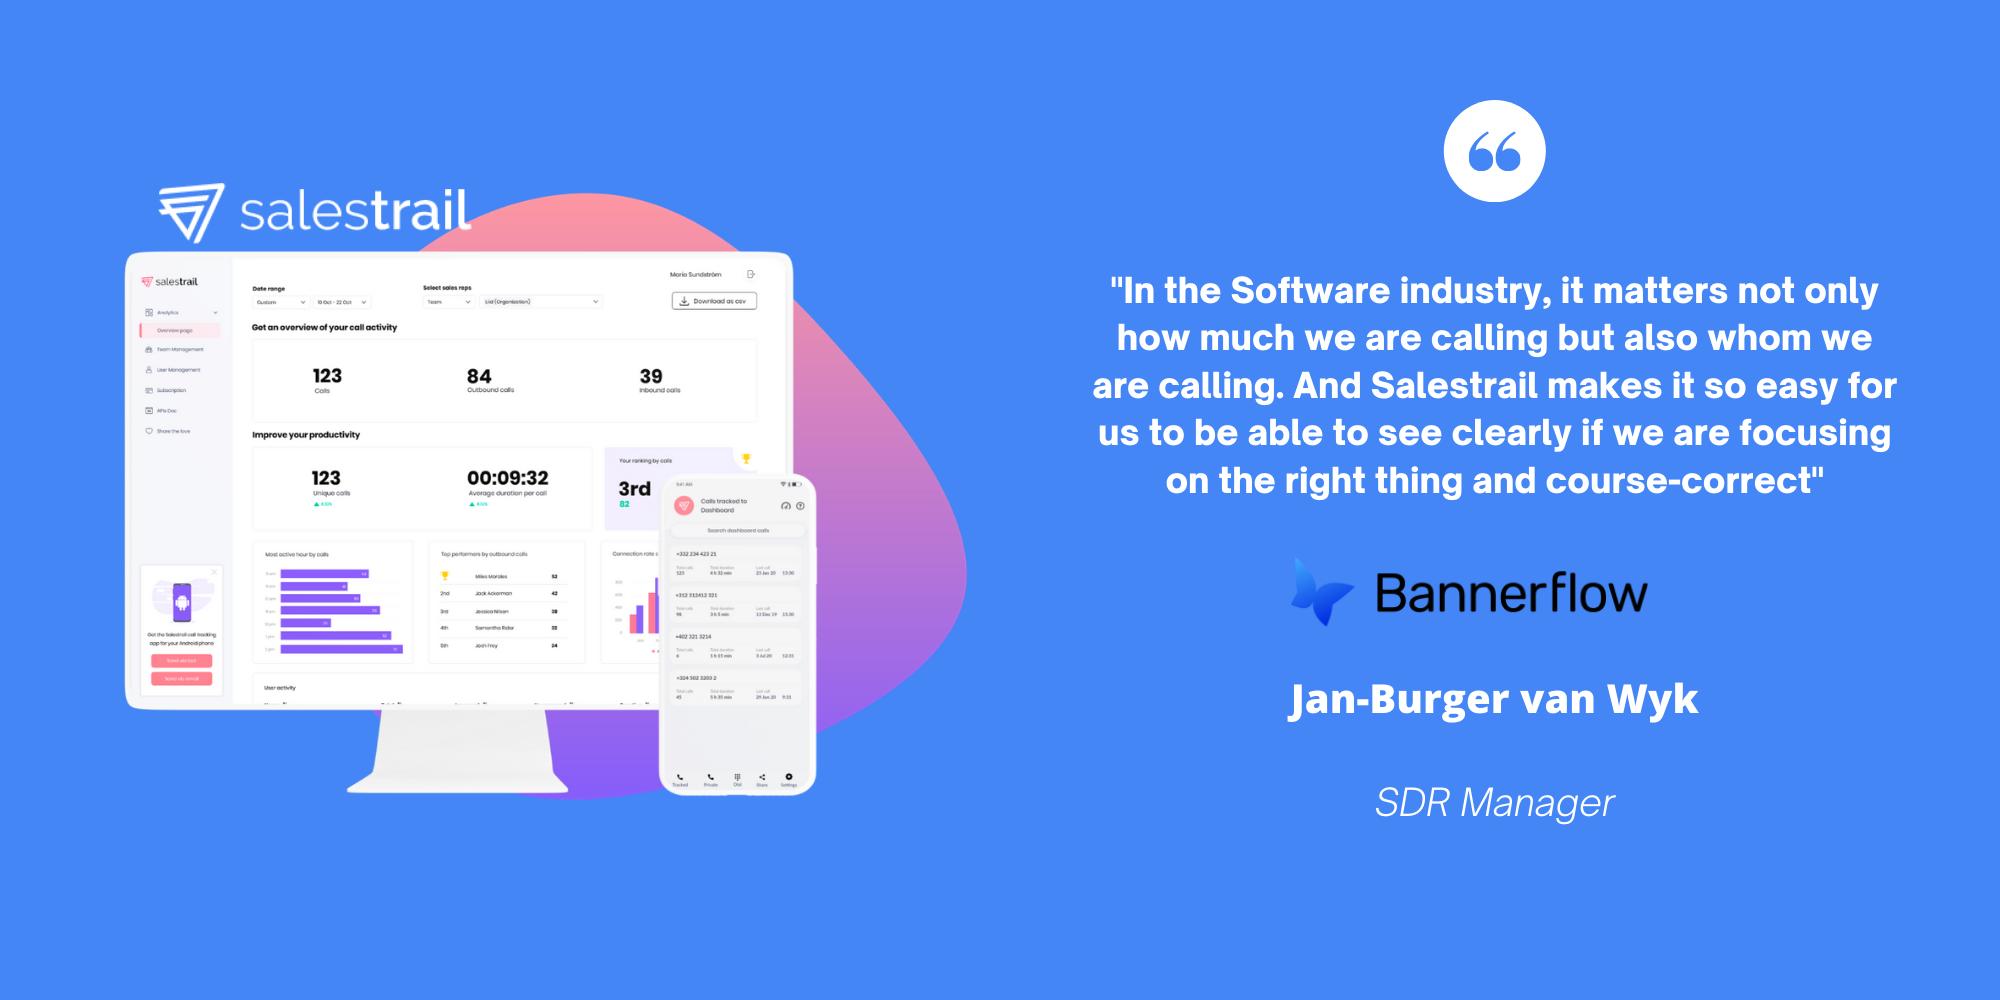 Bannerflow Q2